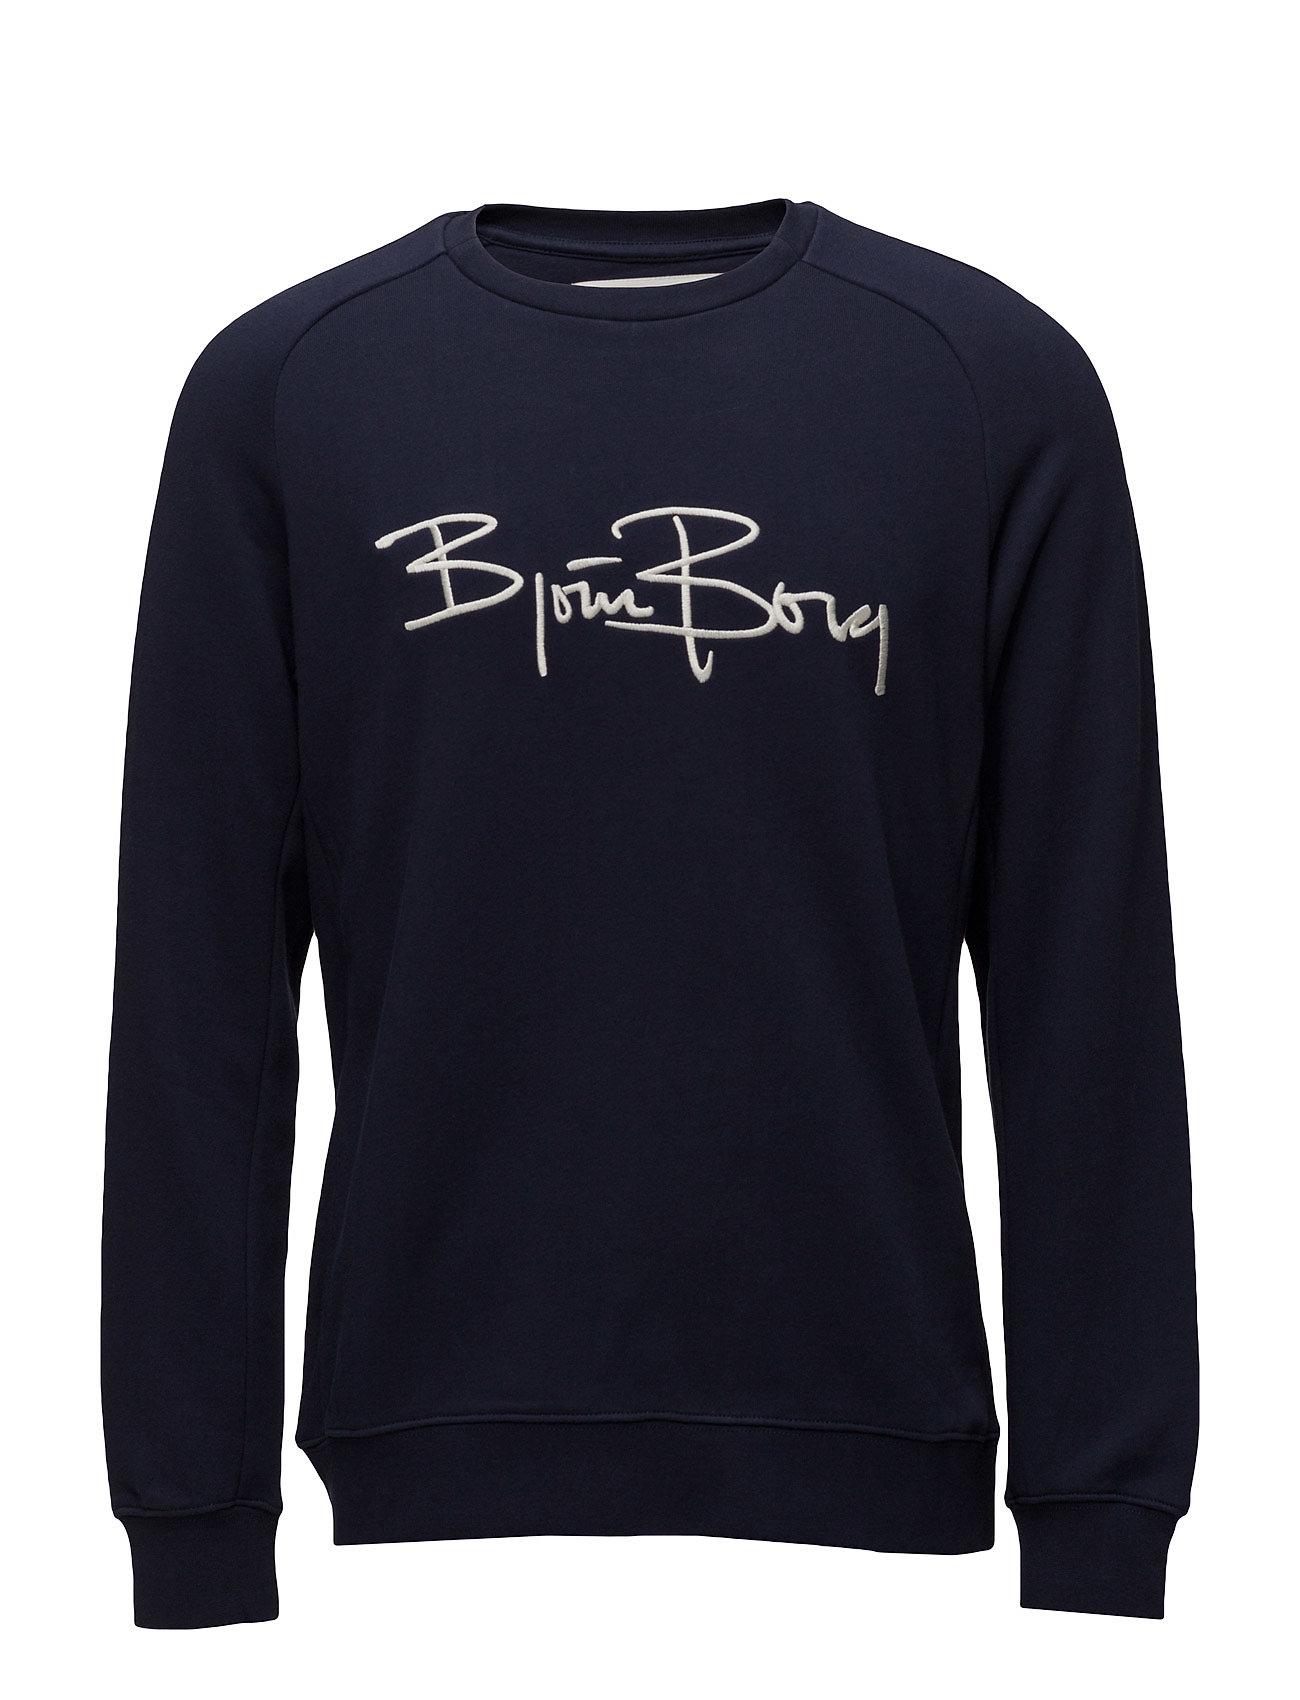 1p Crew Neck Signature¥75 Bjˆrn Borg Sports sweatshirts til Herrer i